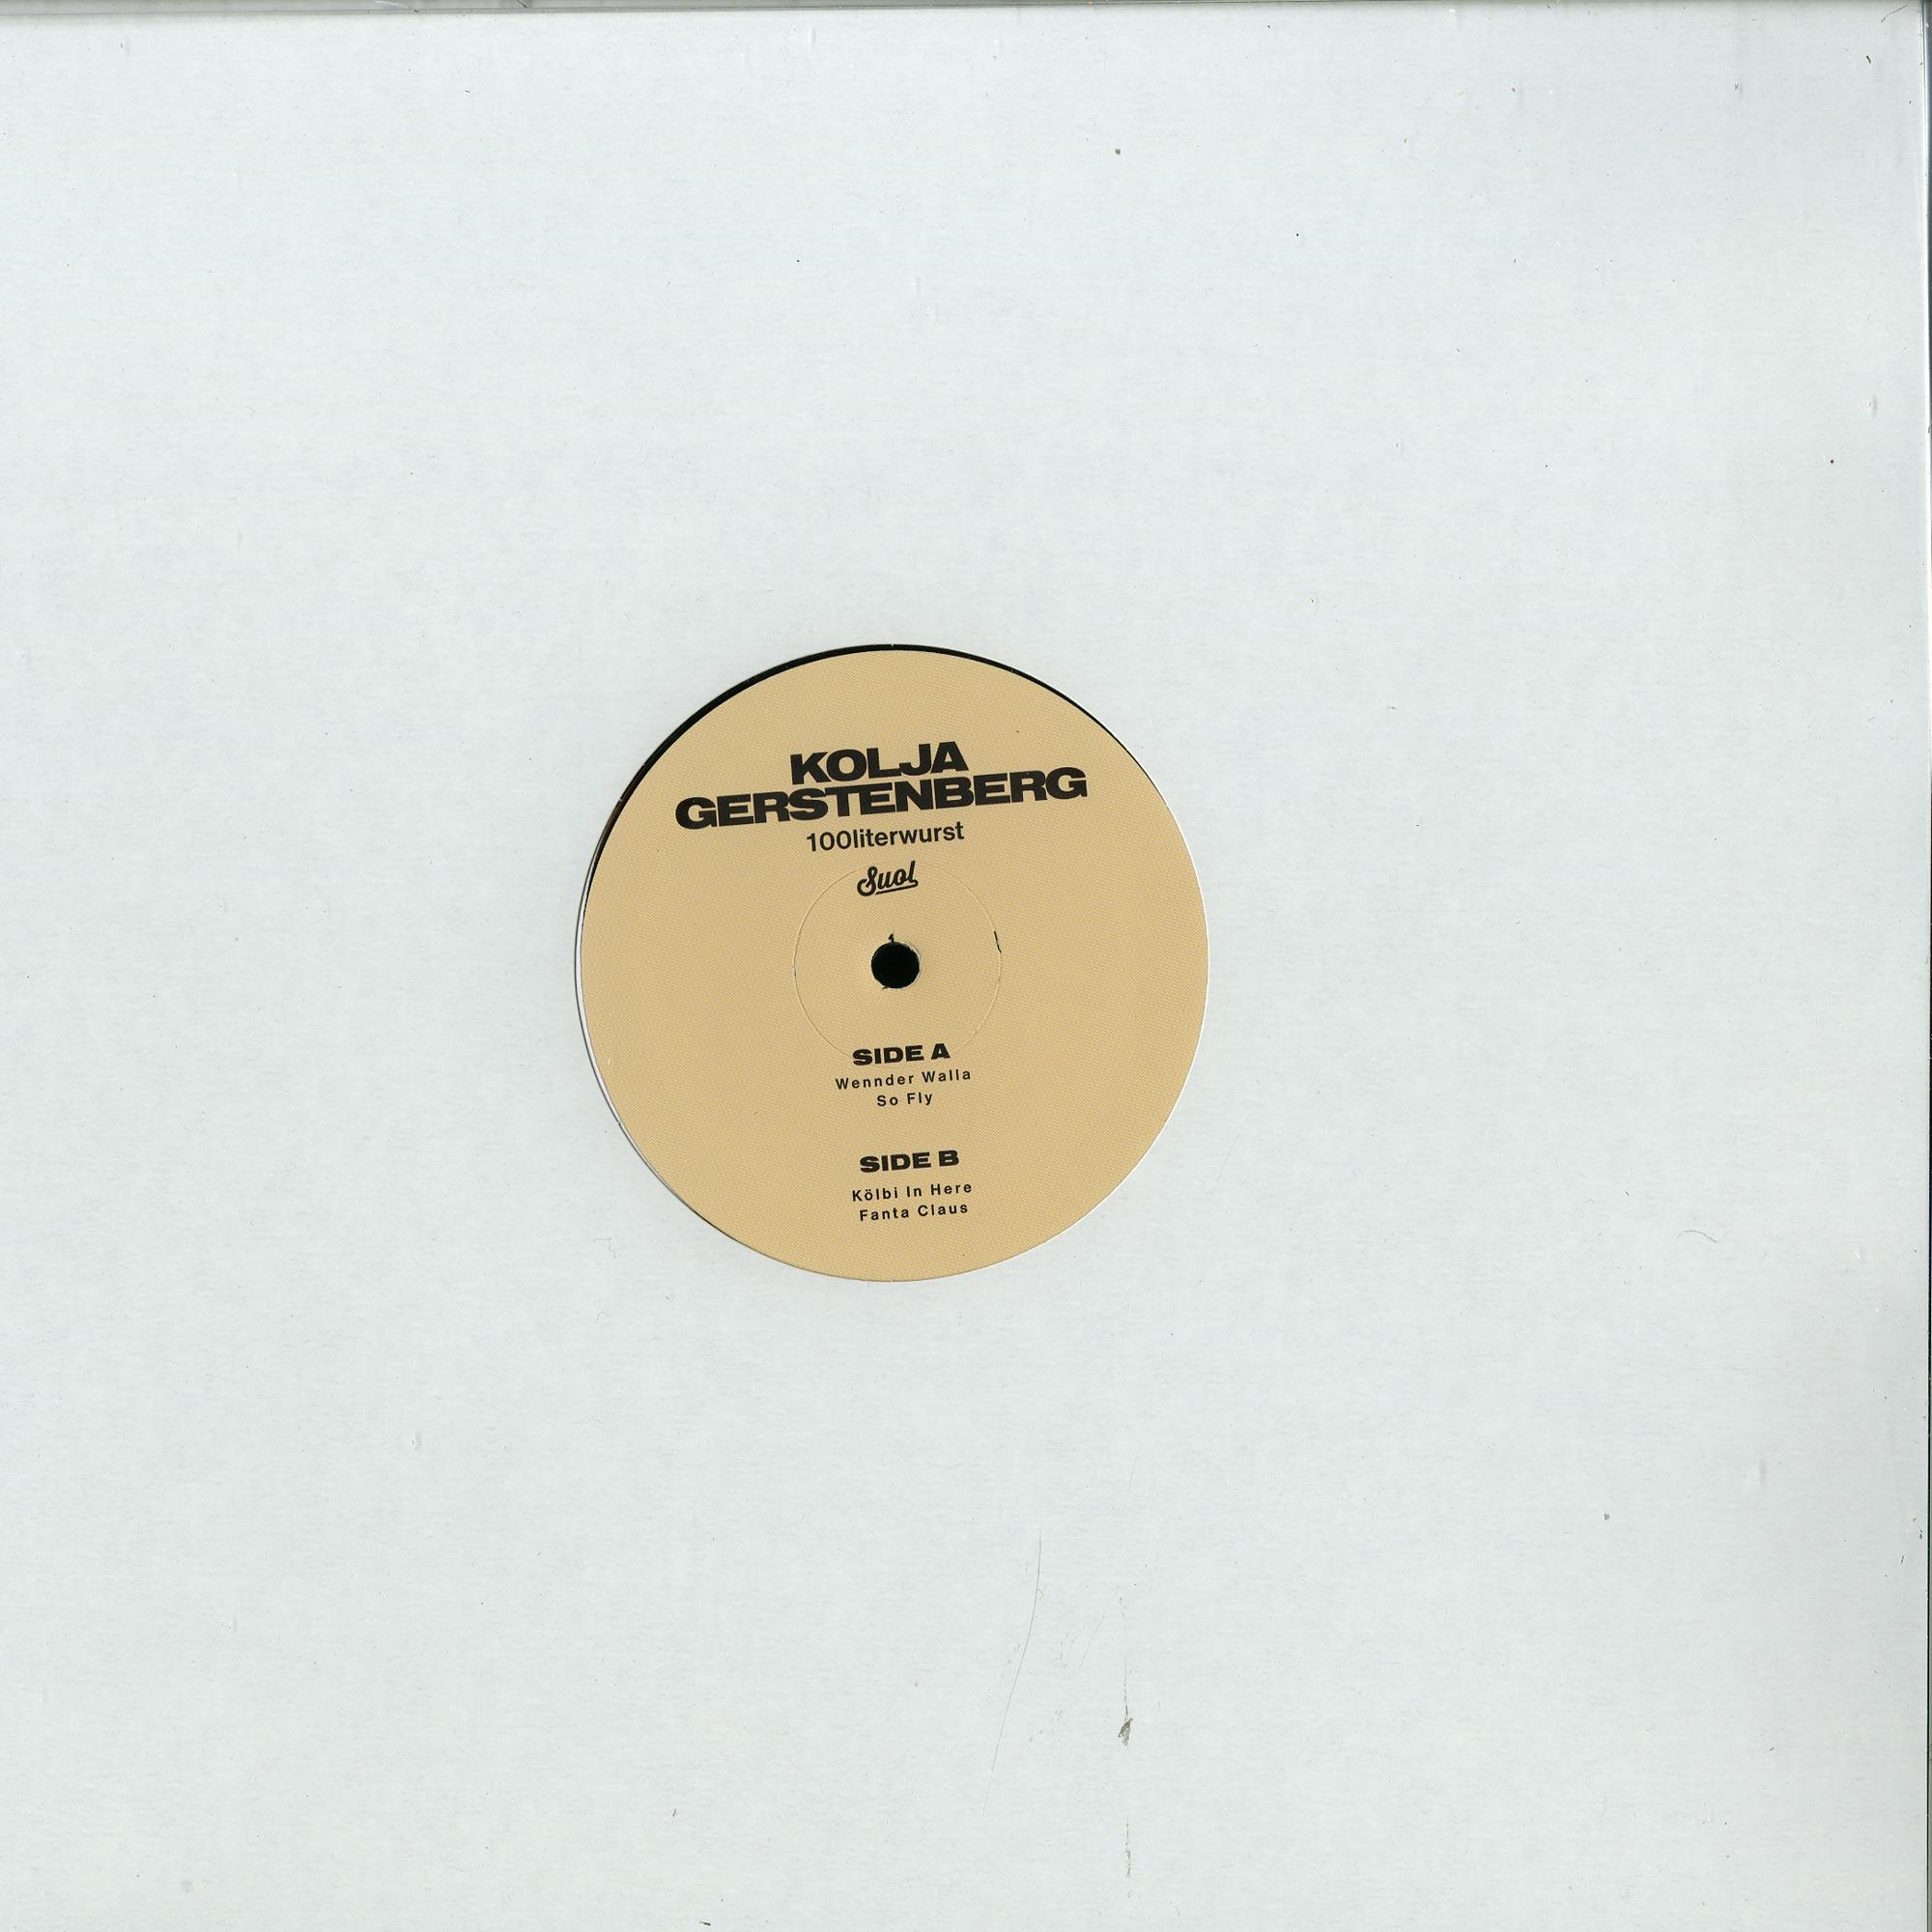 Kolja Gerstenberg - 100LITERWURST EP